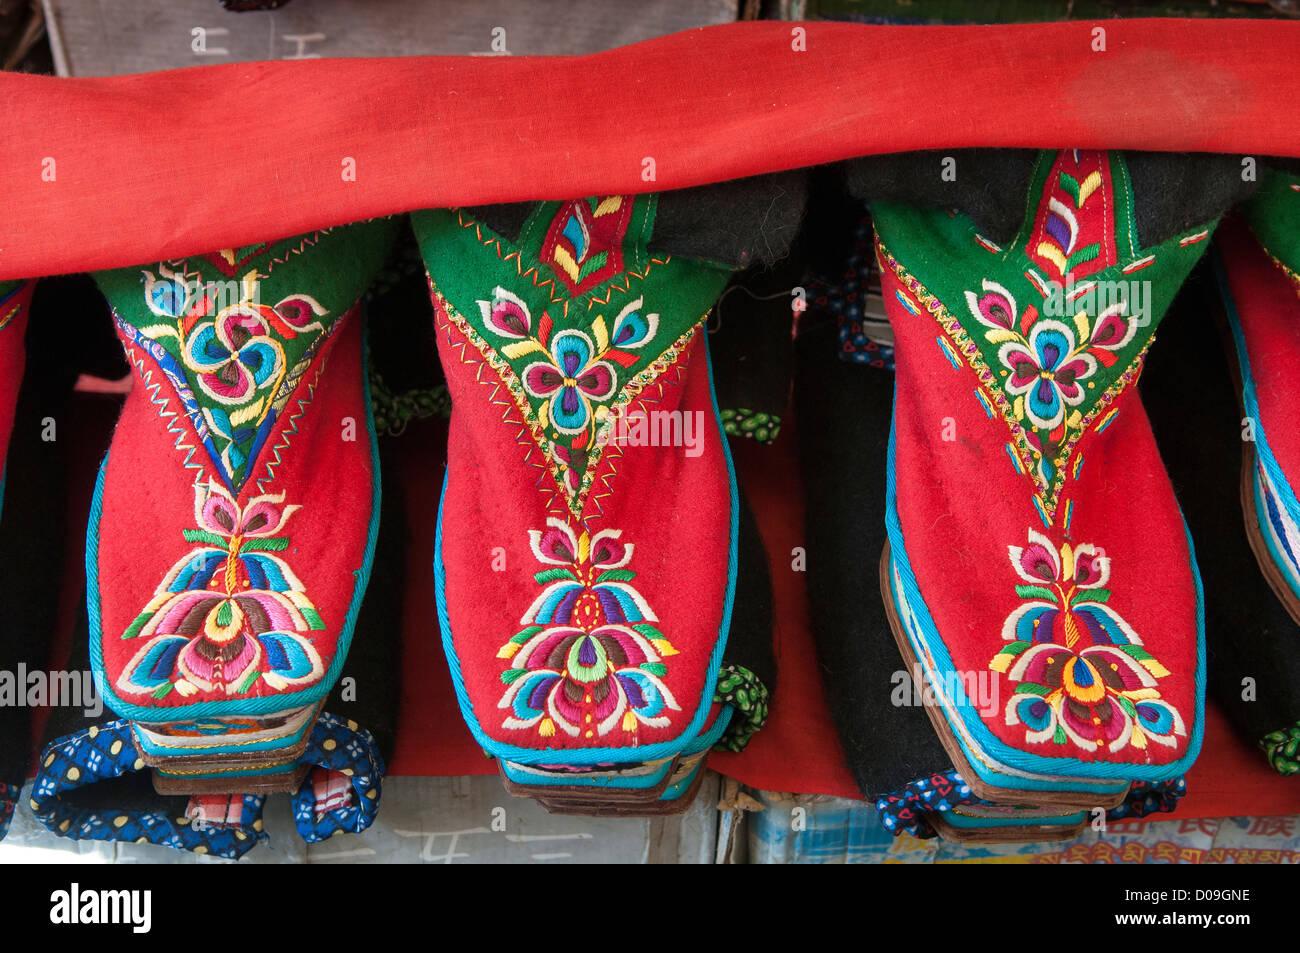 Embrodery boots at souvenir shop, Shigatse, Tibet - Stock Image